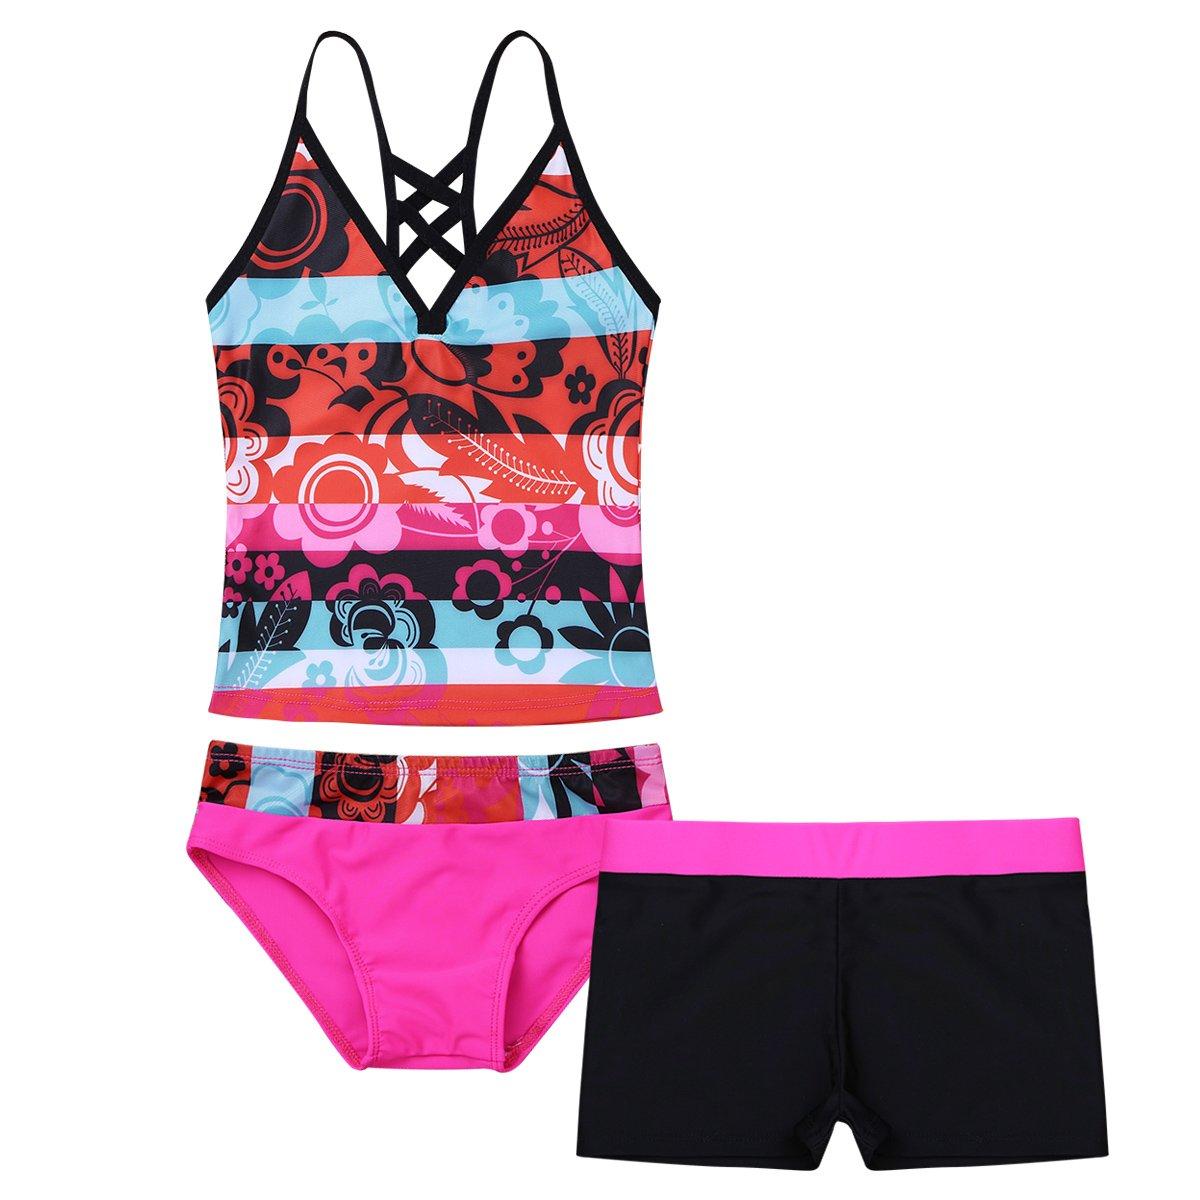 TiaoBug 2Pcs Girls Summer Beach Holiday Halter Tankini Bikini Swimsuit (Hot Pink, 16)